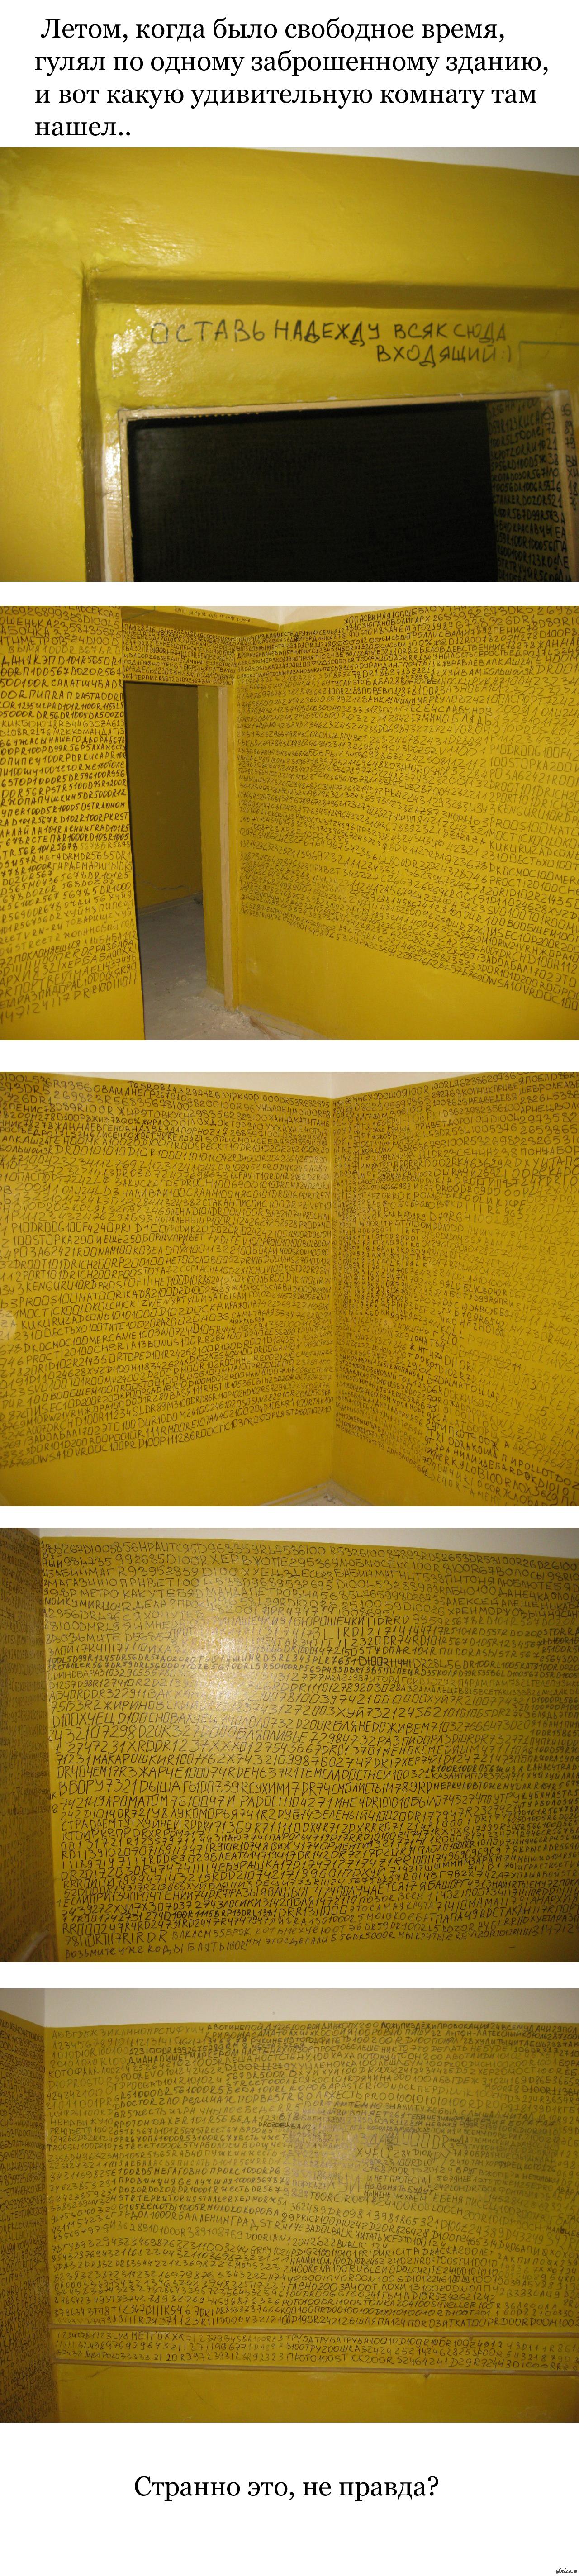 "Психоделическая комната По мотивам <a href=""http://pikabu.ru/story/nashel_strannuyu_tetradku_1922779"">http://pikabu.ru/story/_1922779</a>"